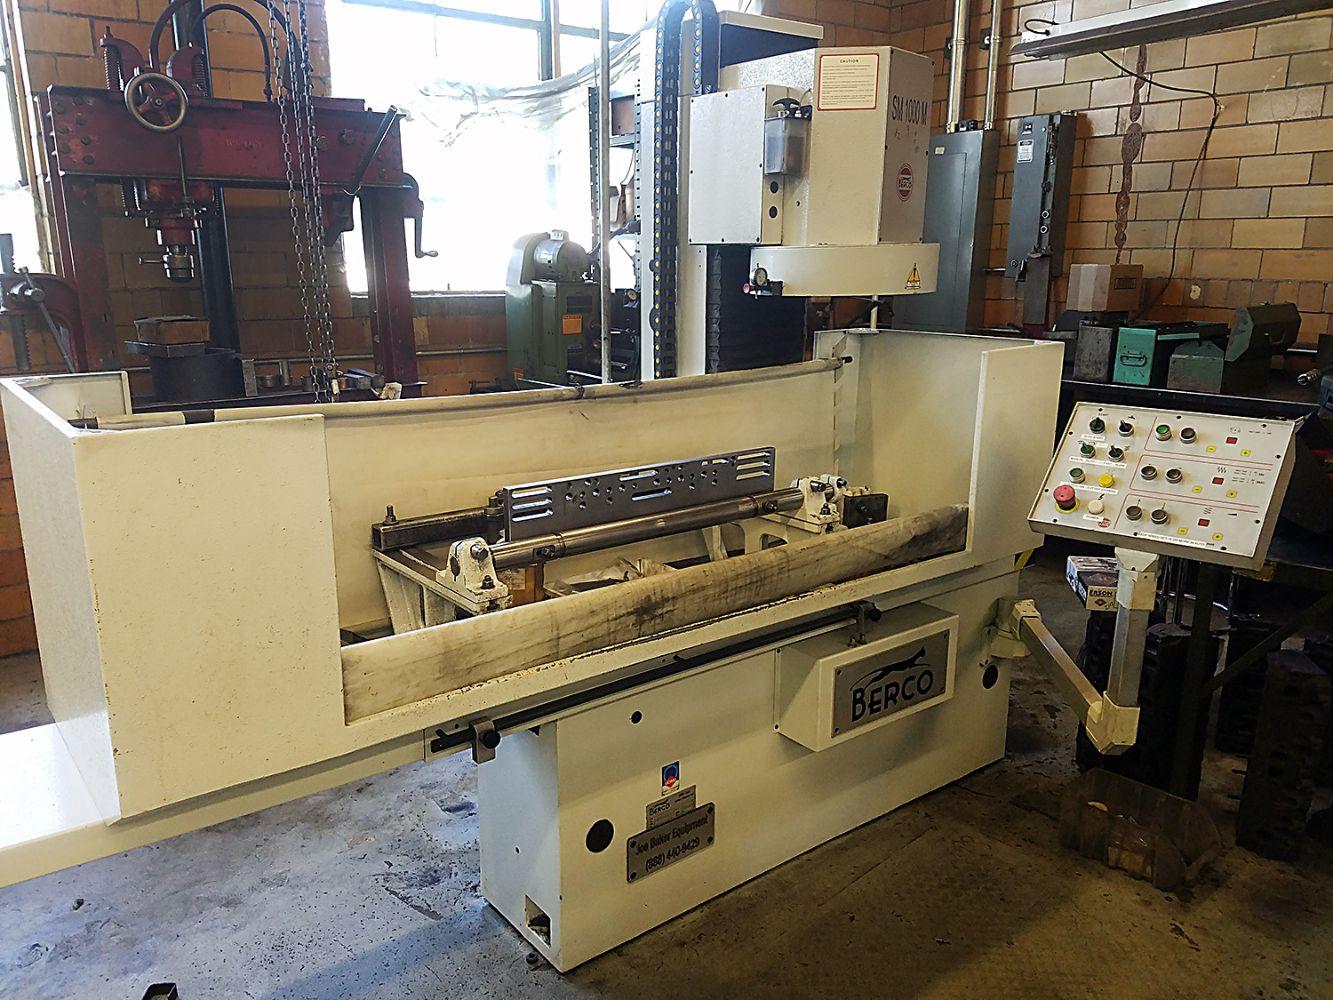 Oak's Machine, Inc.- Complete Well-Equipped Automotive Machine Shop